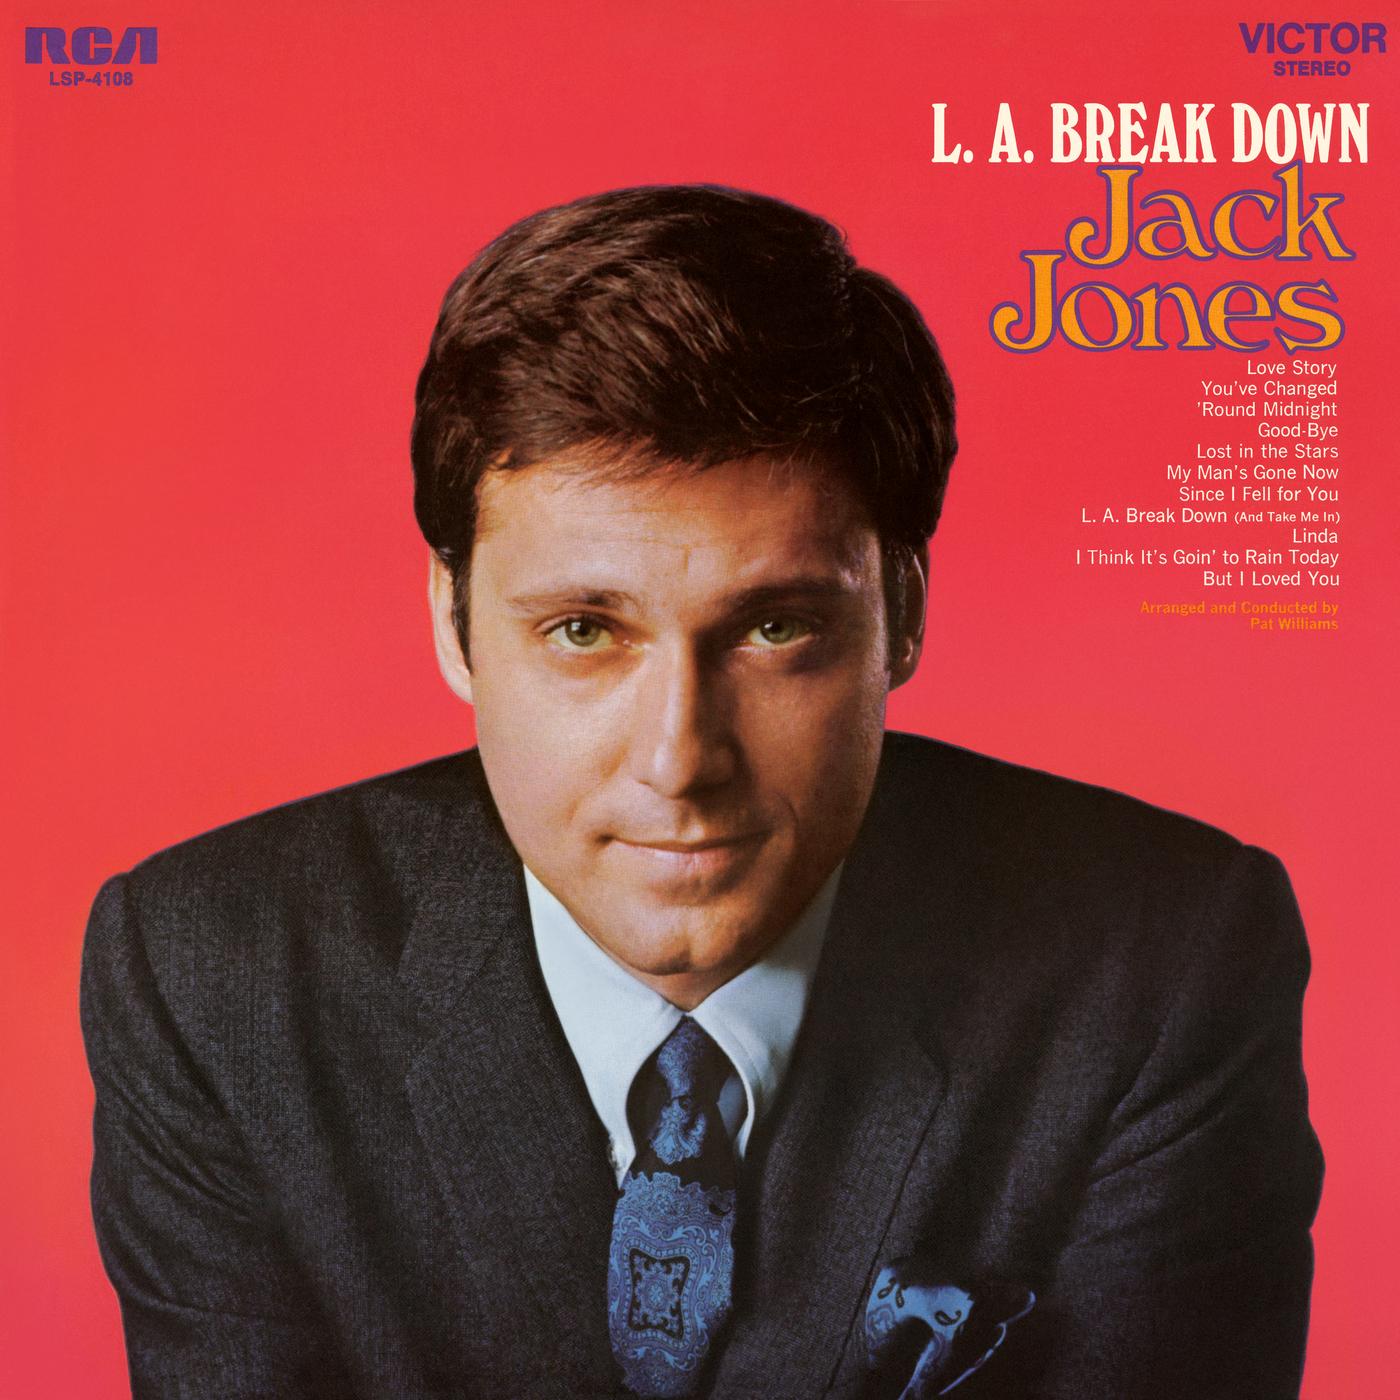 L.A. Break Down - Jack Jones